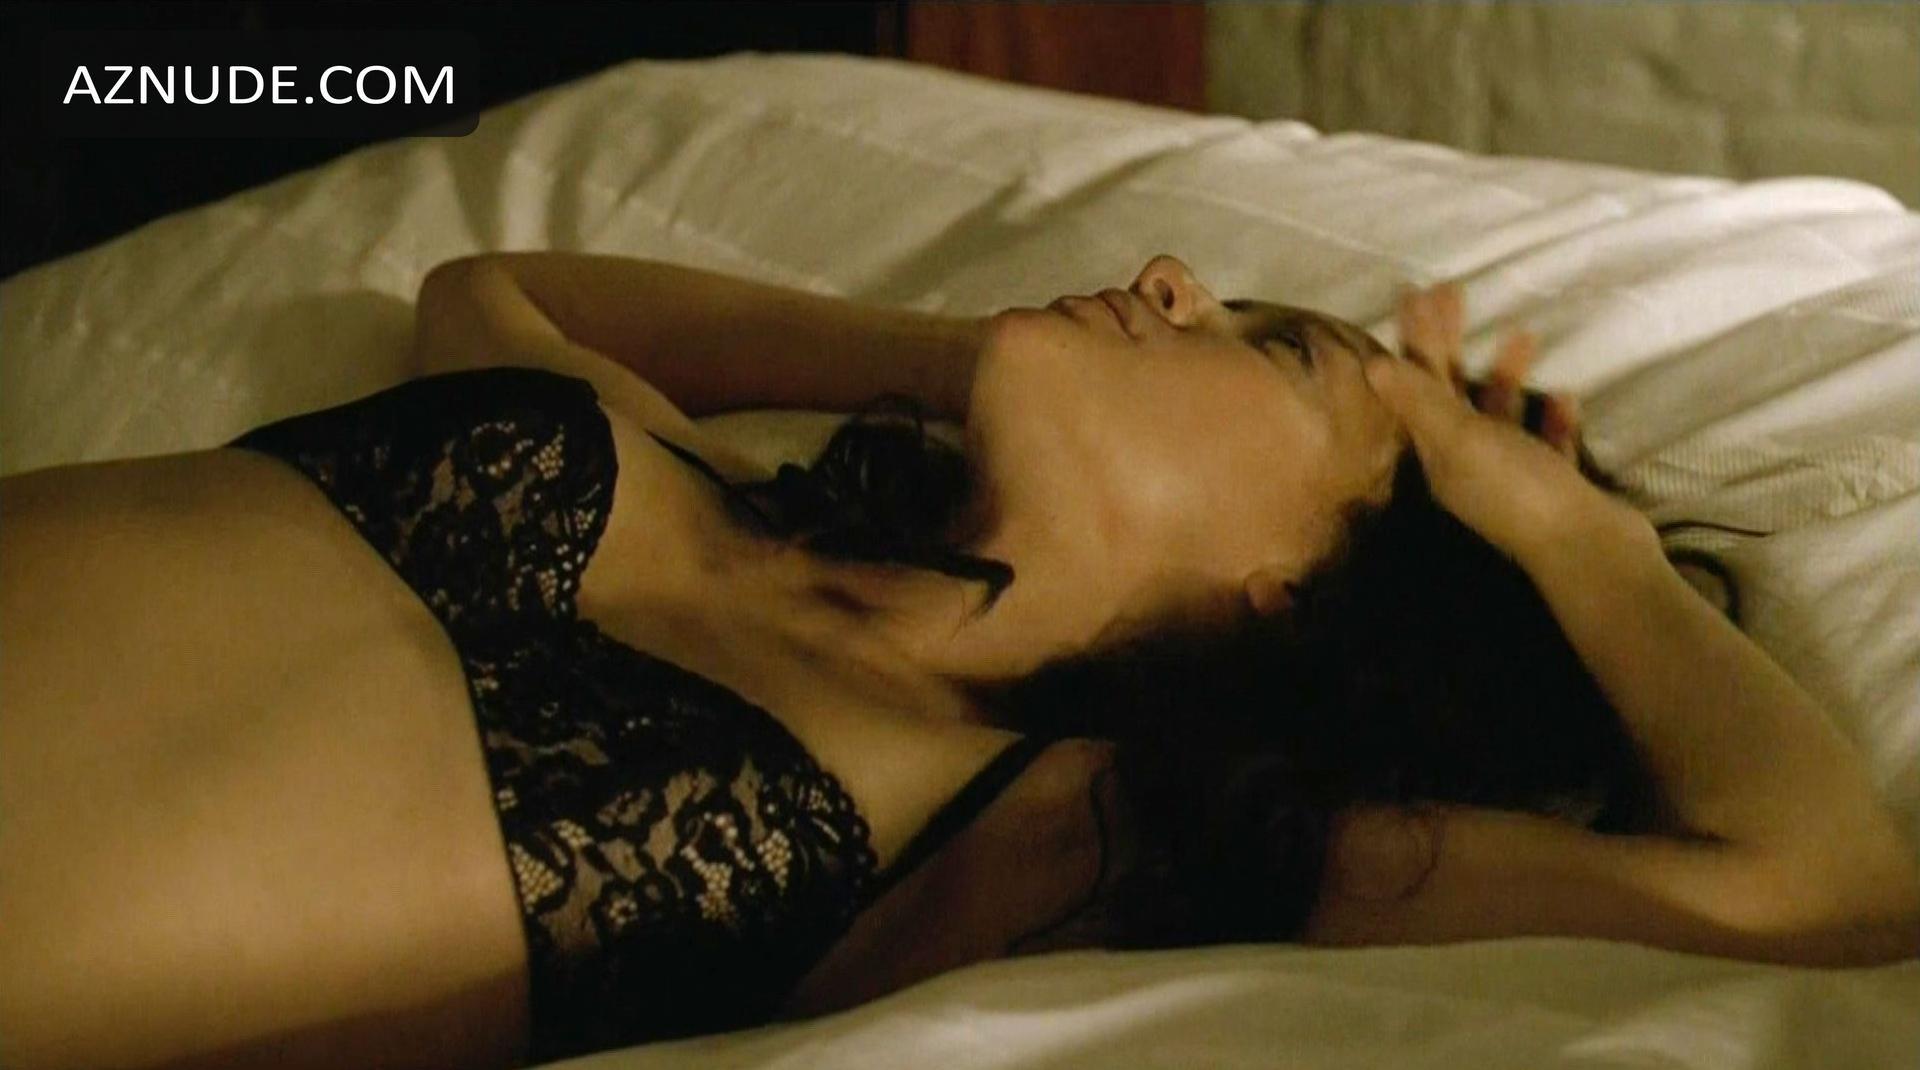 Alexandra daddario car sex scene at scandalpostcom - 2 part 8